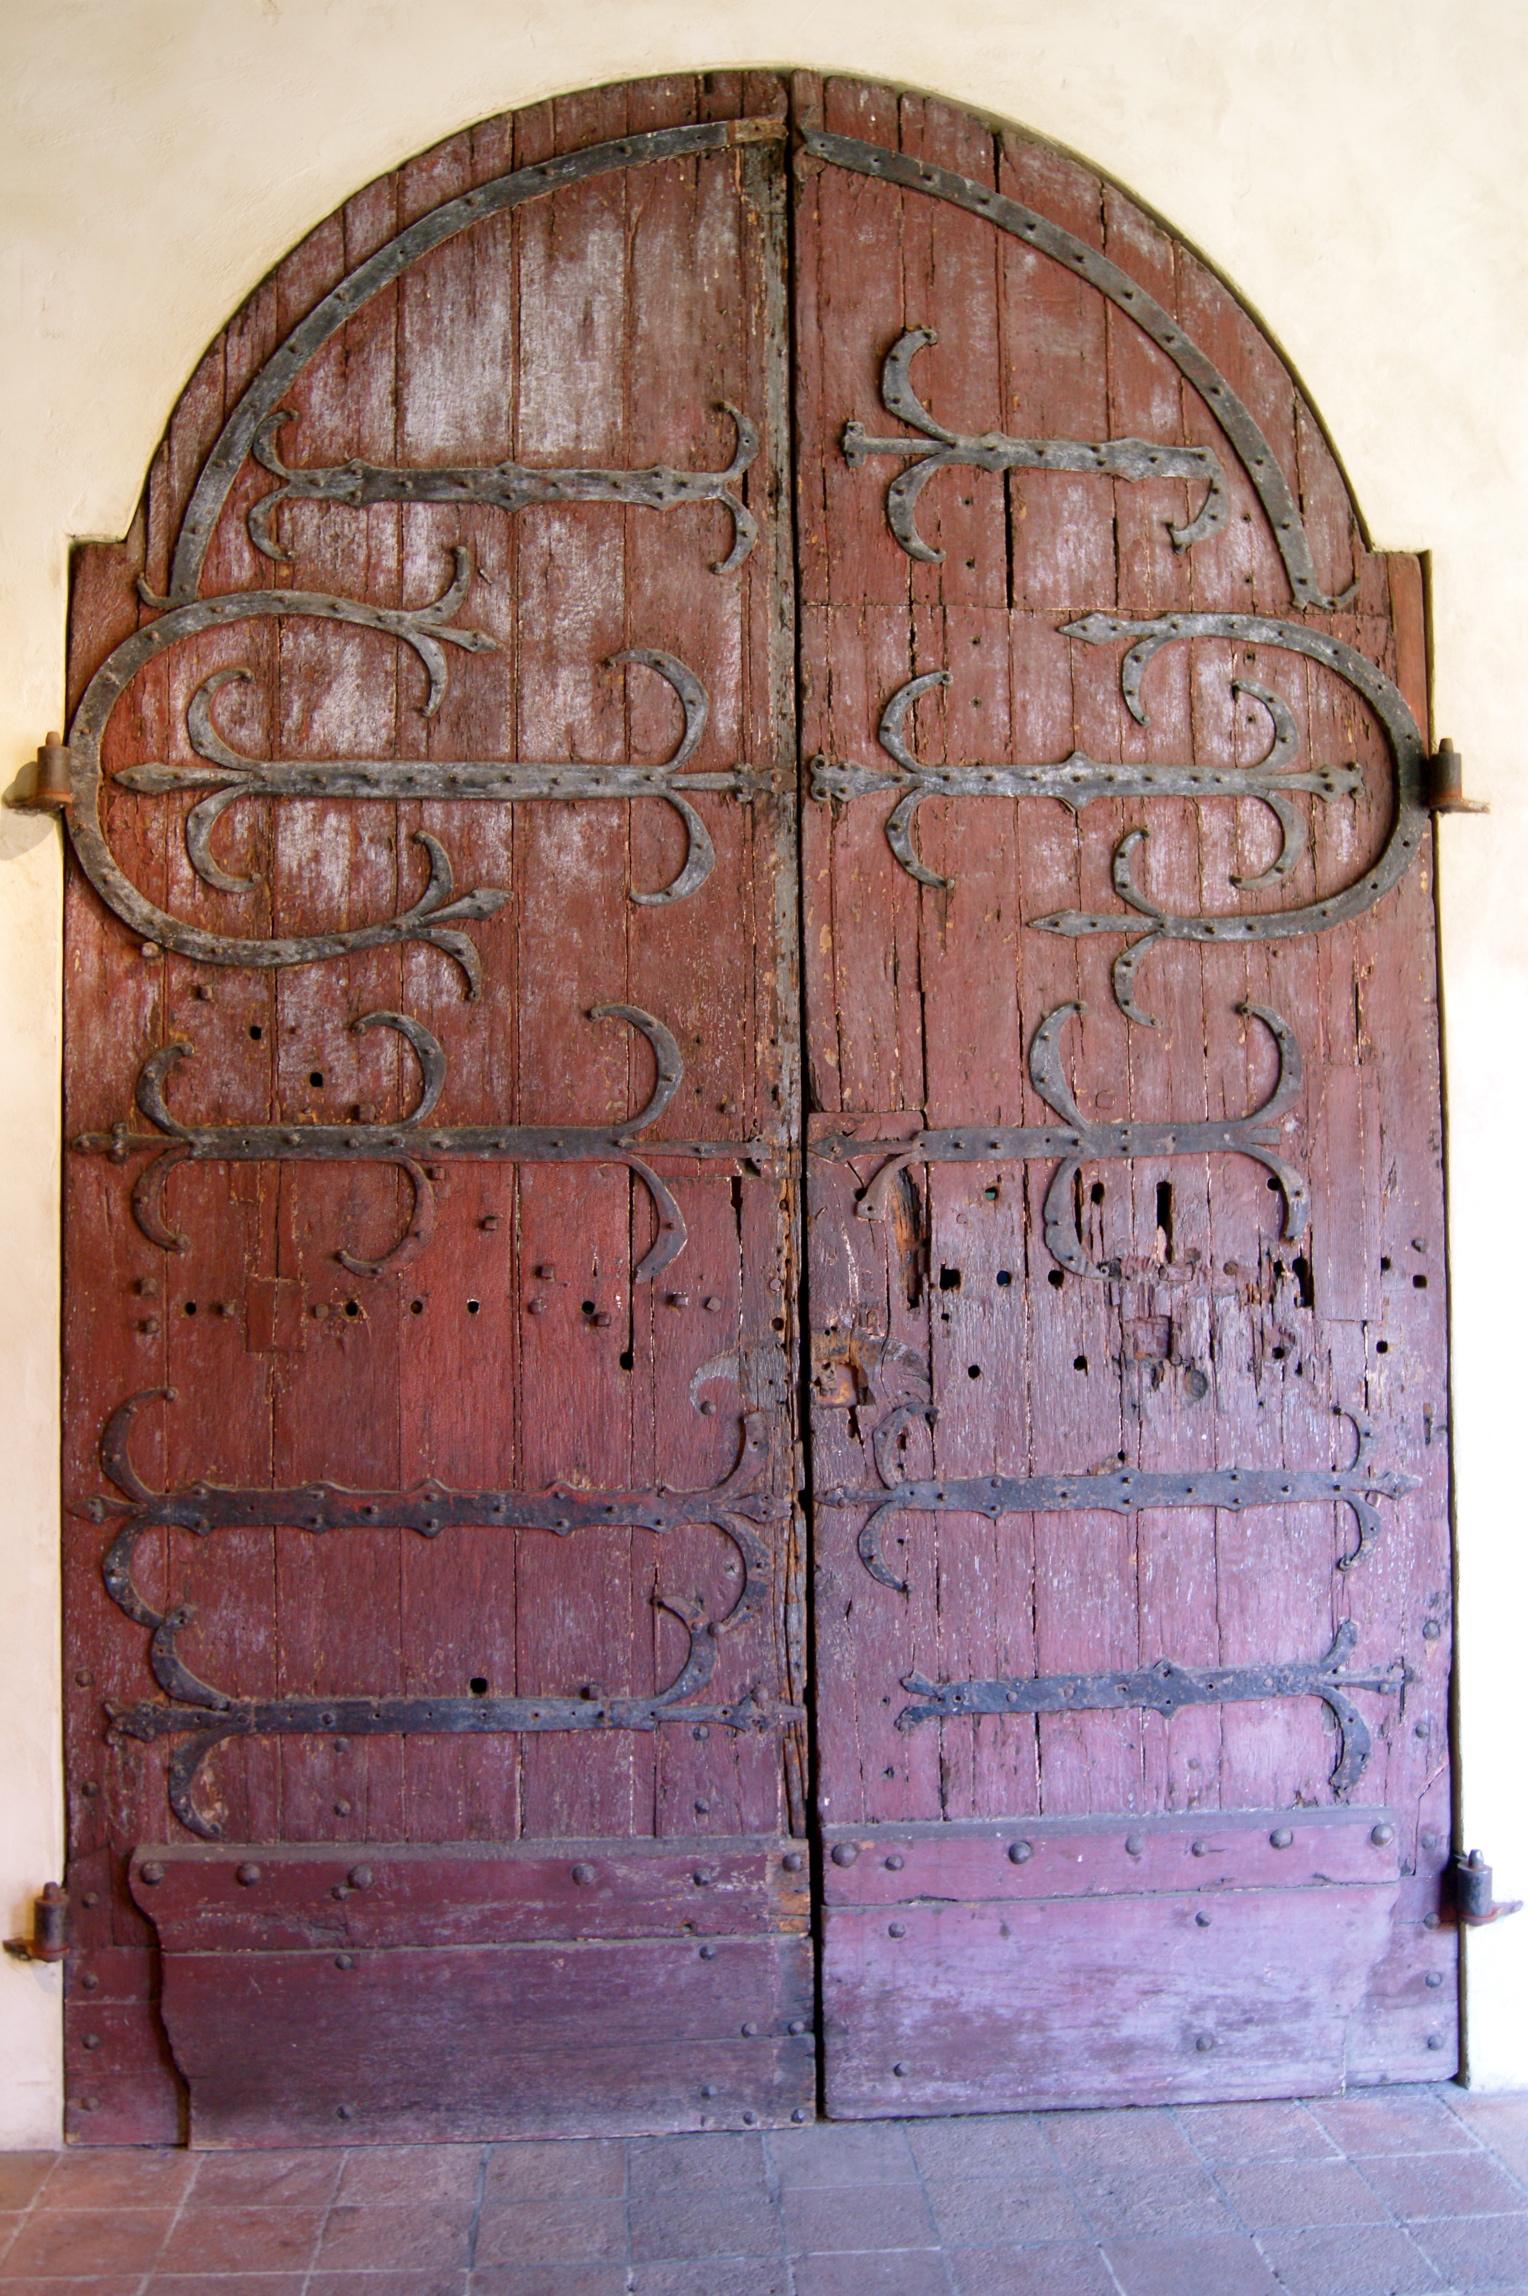 Old door, locking up secrets :O